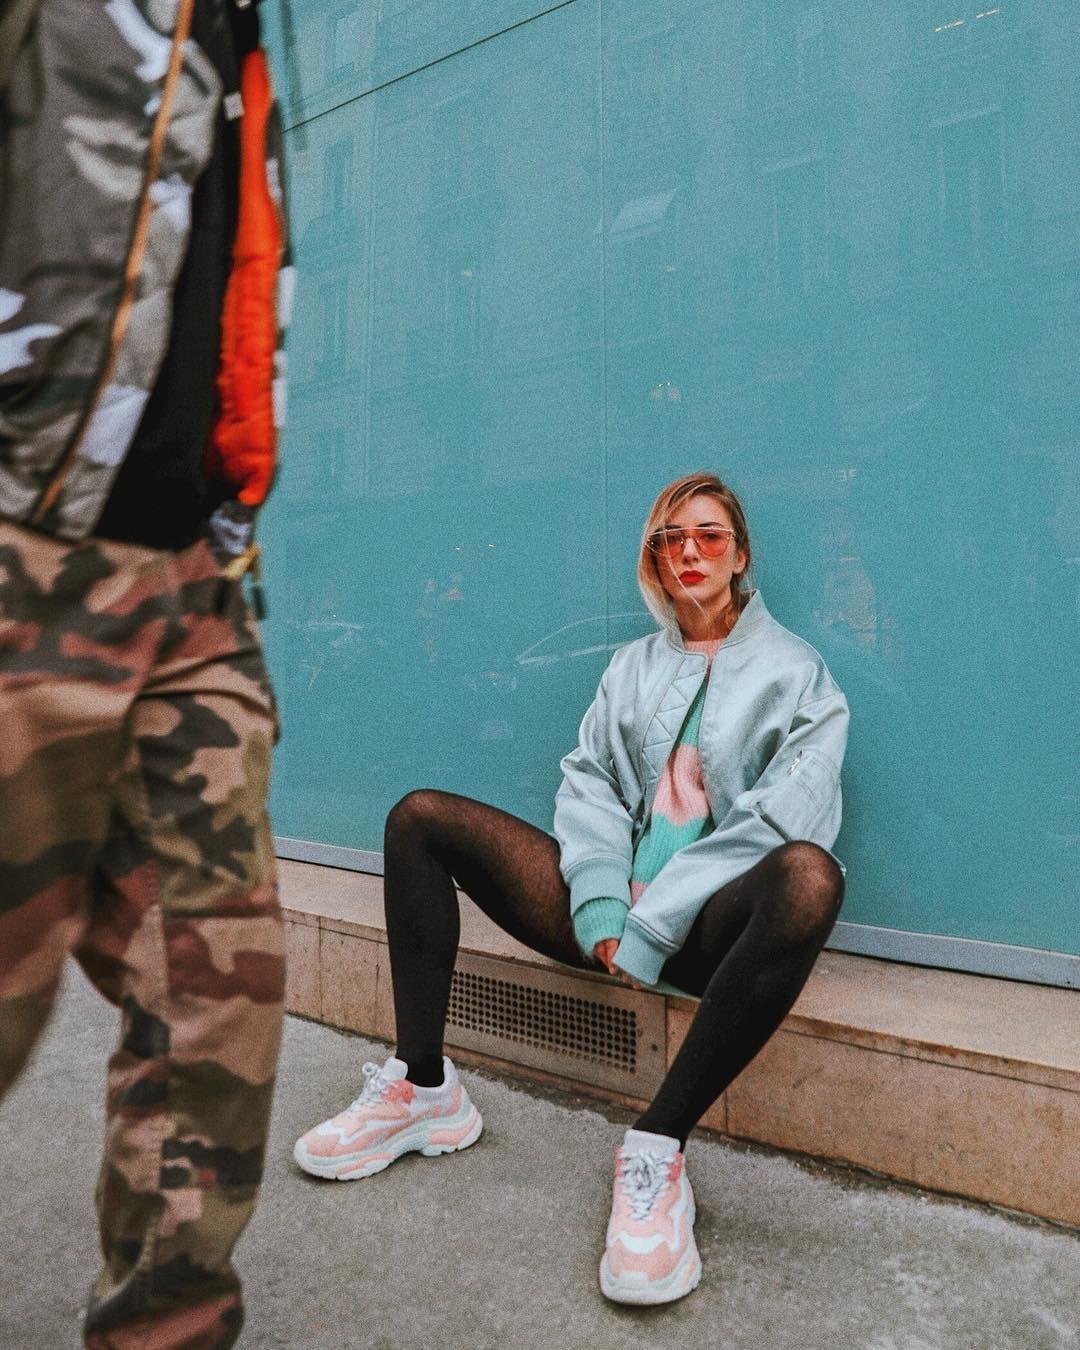 Sneakers addict femme blog